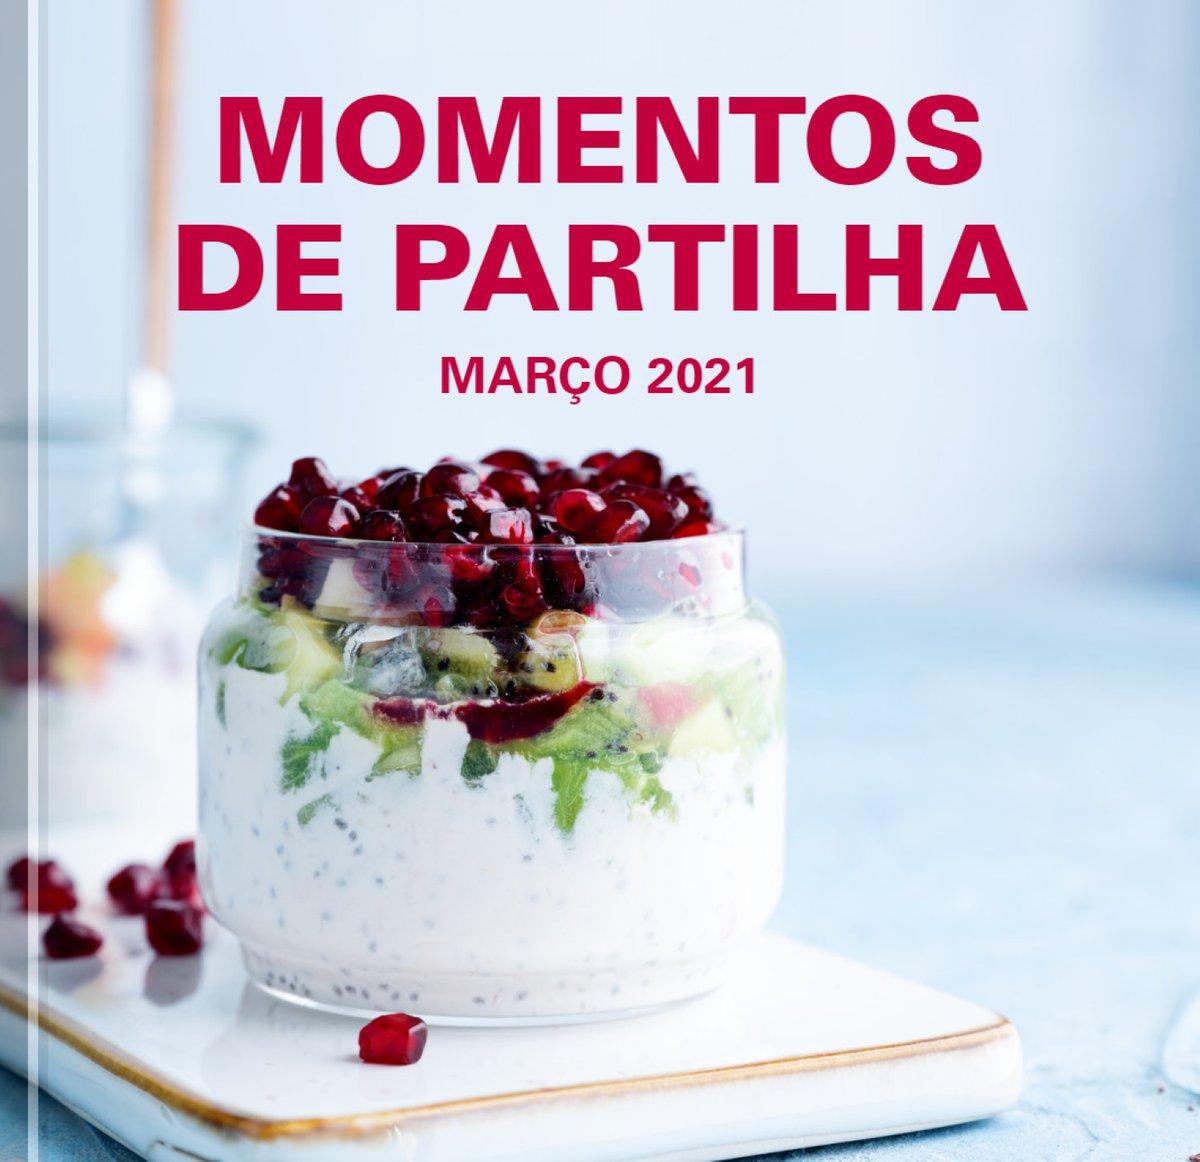 "Cookidoo®: Colecção ""Momentos de Partilha - Março 2020"" #bimby #thermomix #bimbyworld #truecooks #yougottaeatthis #foodstagram #yum #foodphotography #foodbloggers #instayum #instafood #food #homecooking #foodpics #foodlover #eatstagram #portuguese #portu"